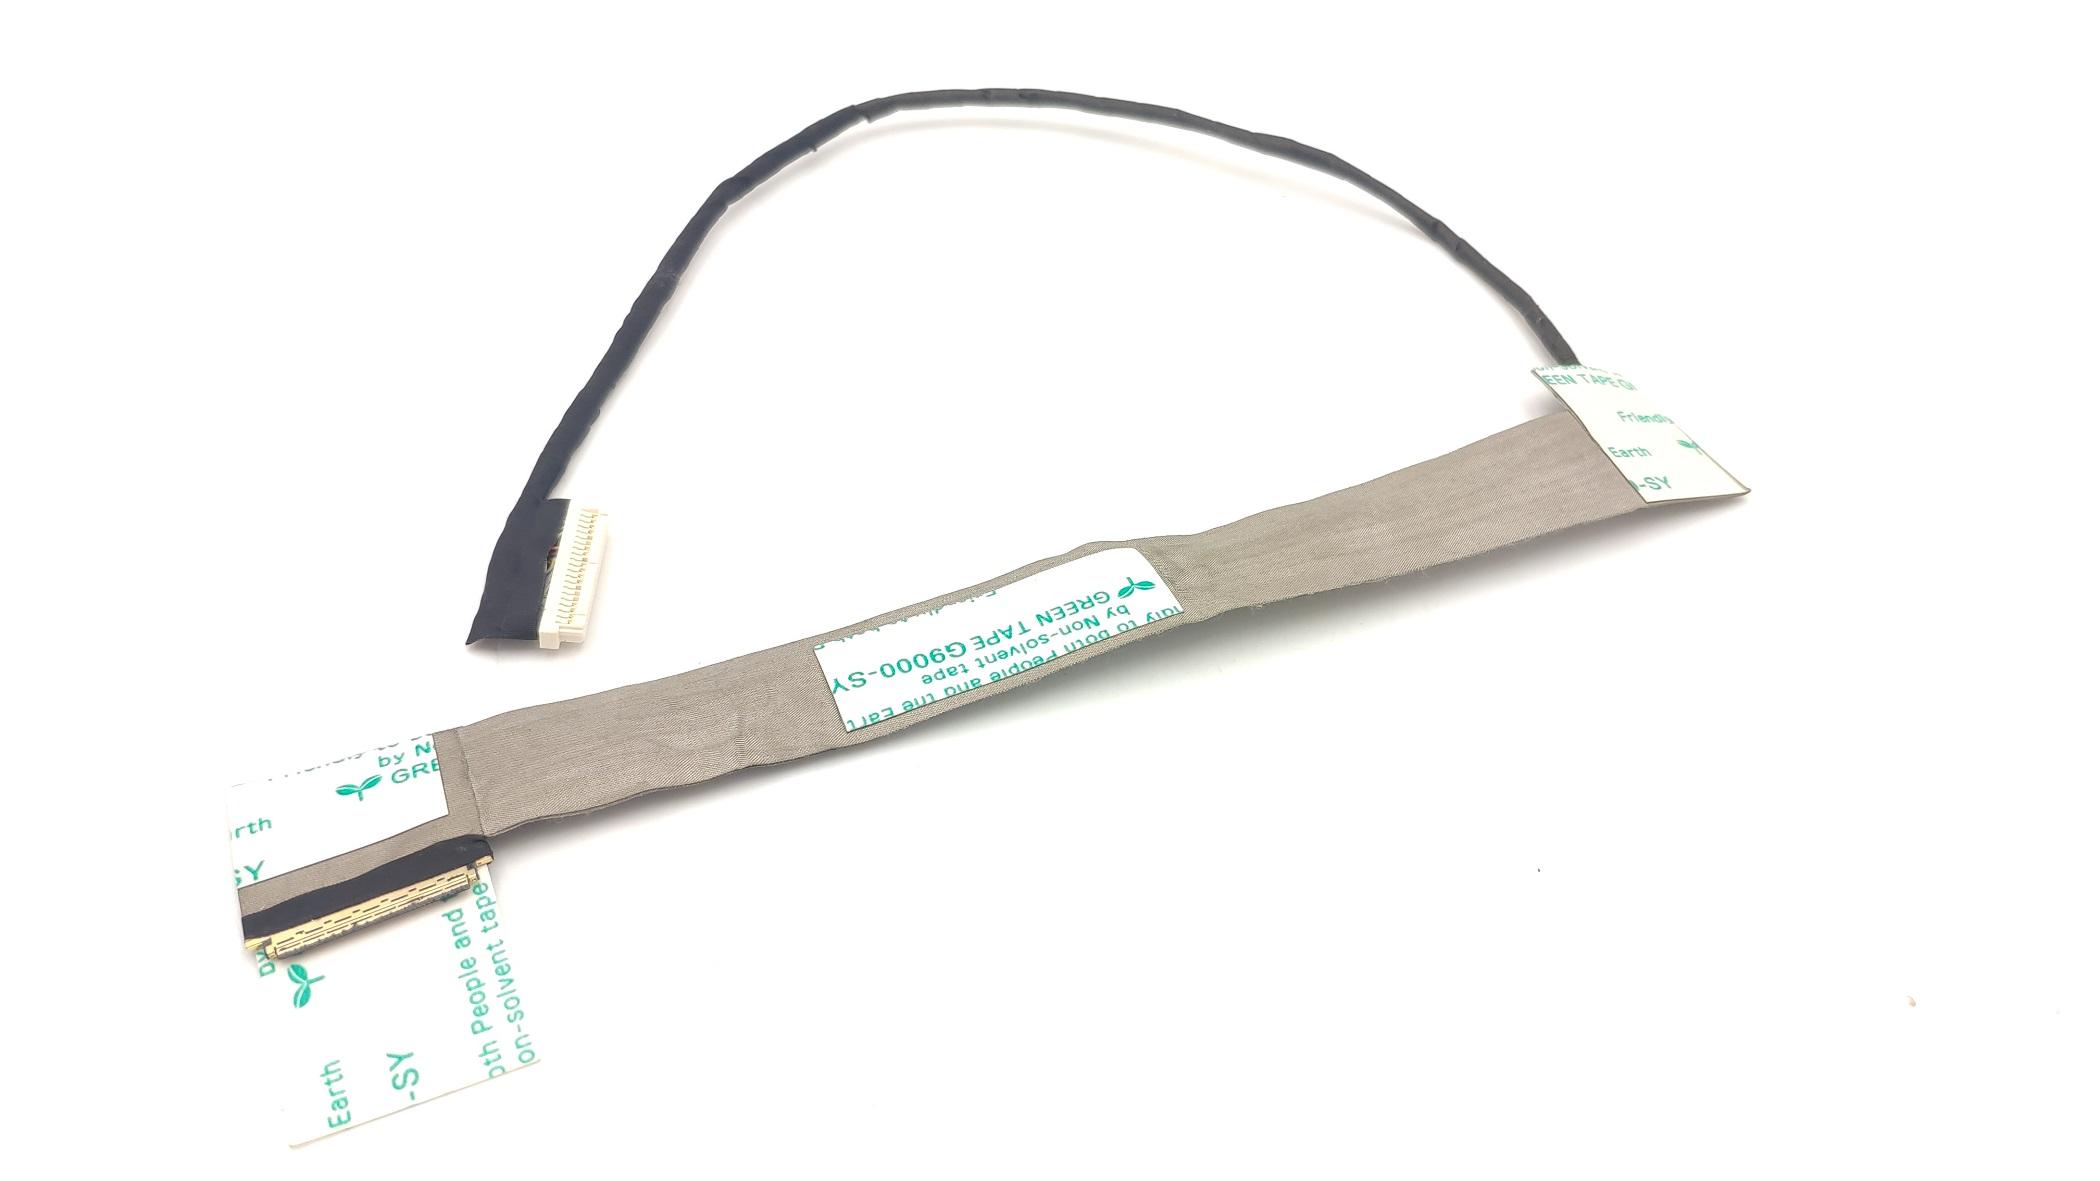 piezasdeportatil.es - Cable Lcd Lenovo Y550 DC020001J10